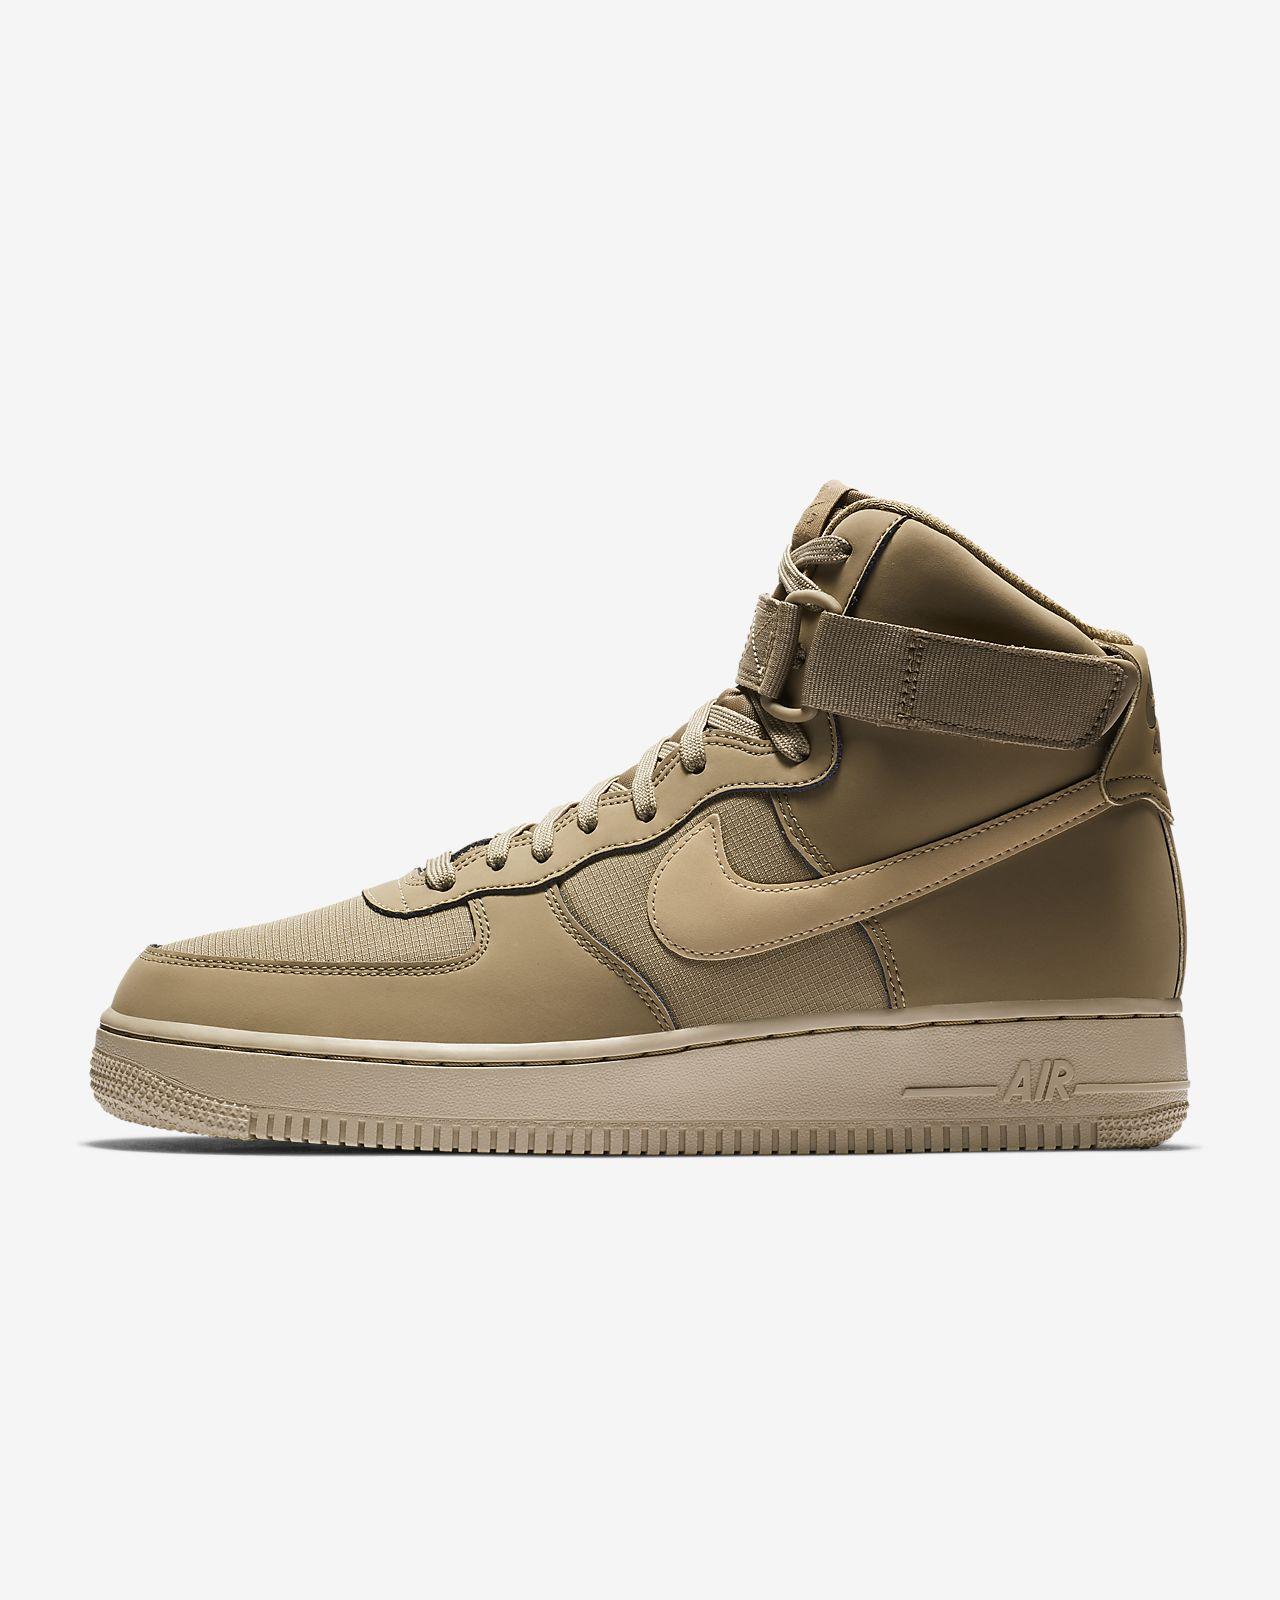 7d1fb3192c65 Nike Air Force 1 High 07 Men s Shoe. Nike.com